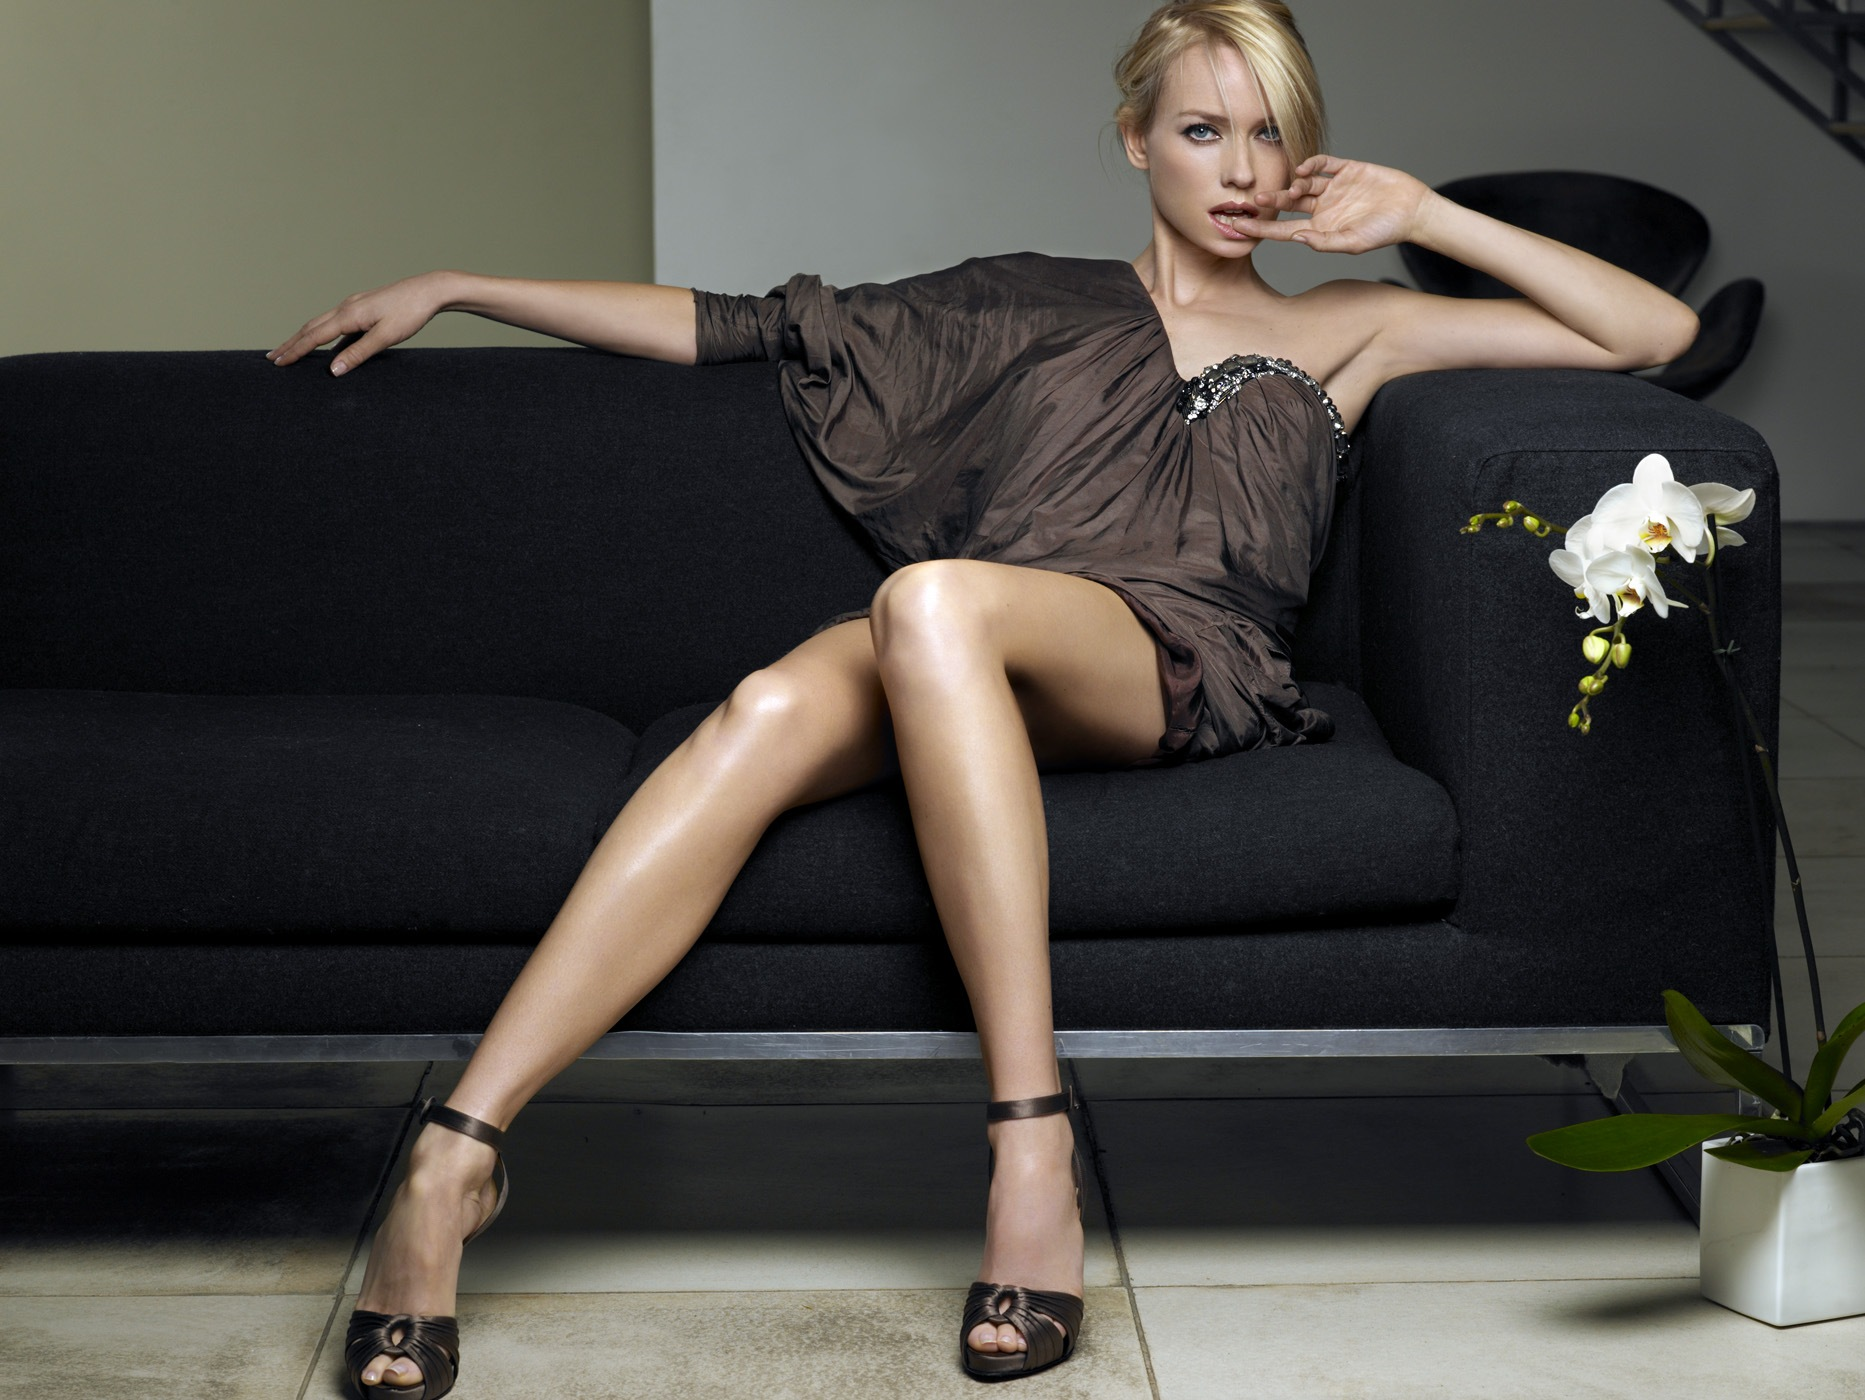 Sui He CHN 8 2011?resent,Phongchi (b. 1990 Vietnamese descent Erotic clip Debbie Rochon,Denys Arcand